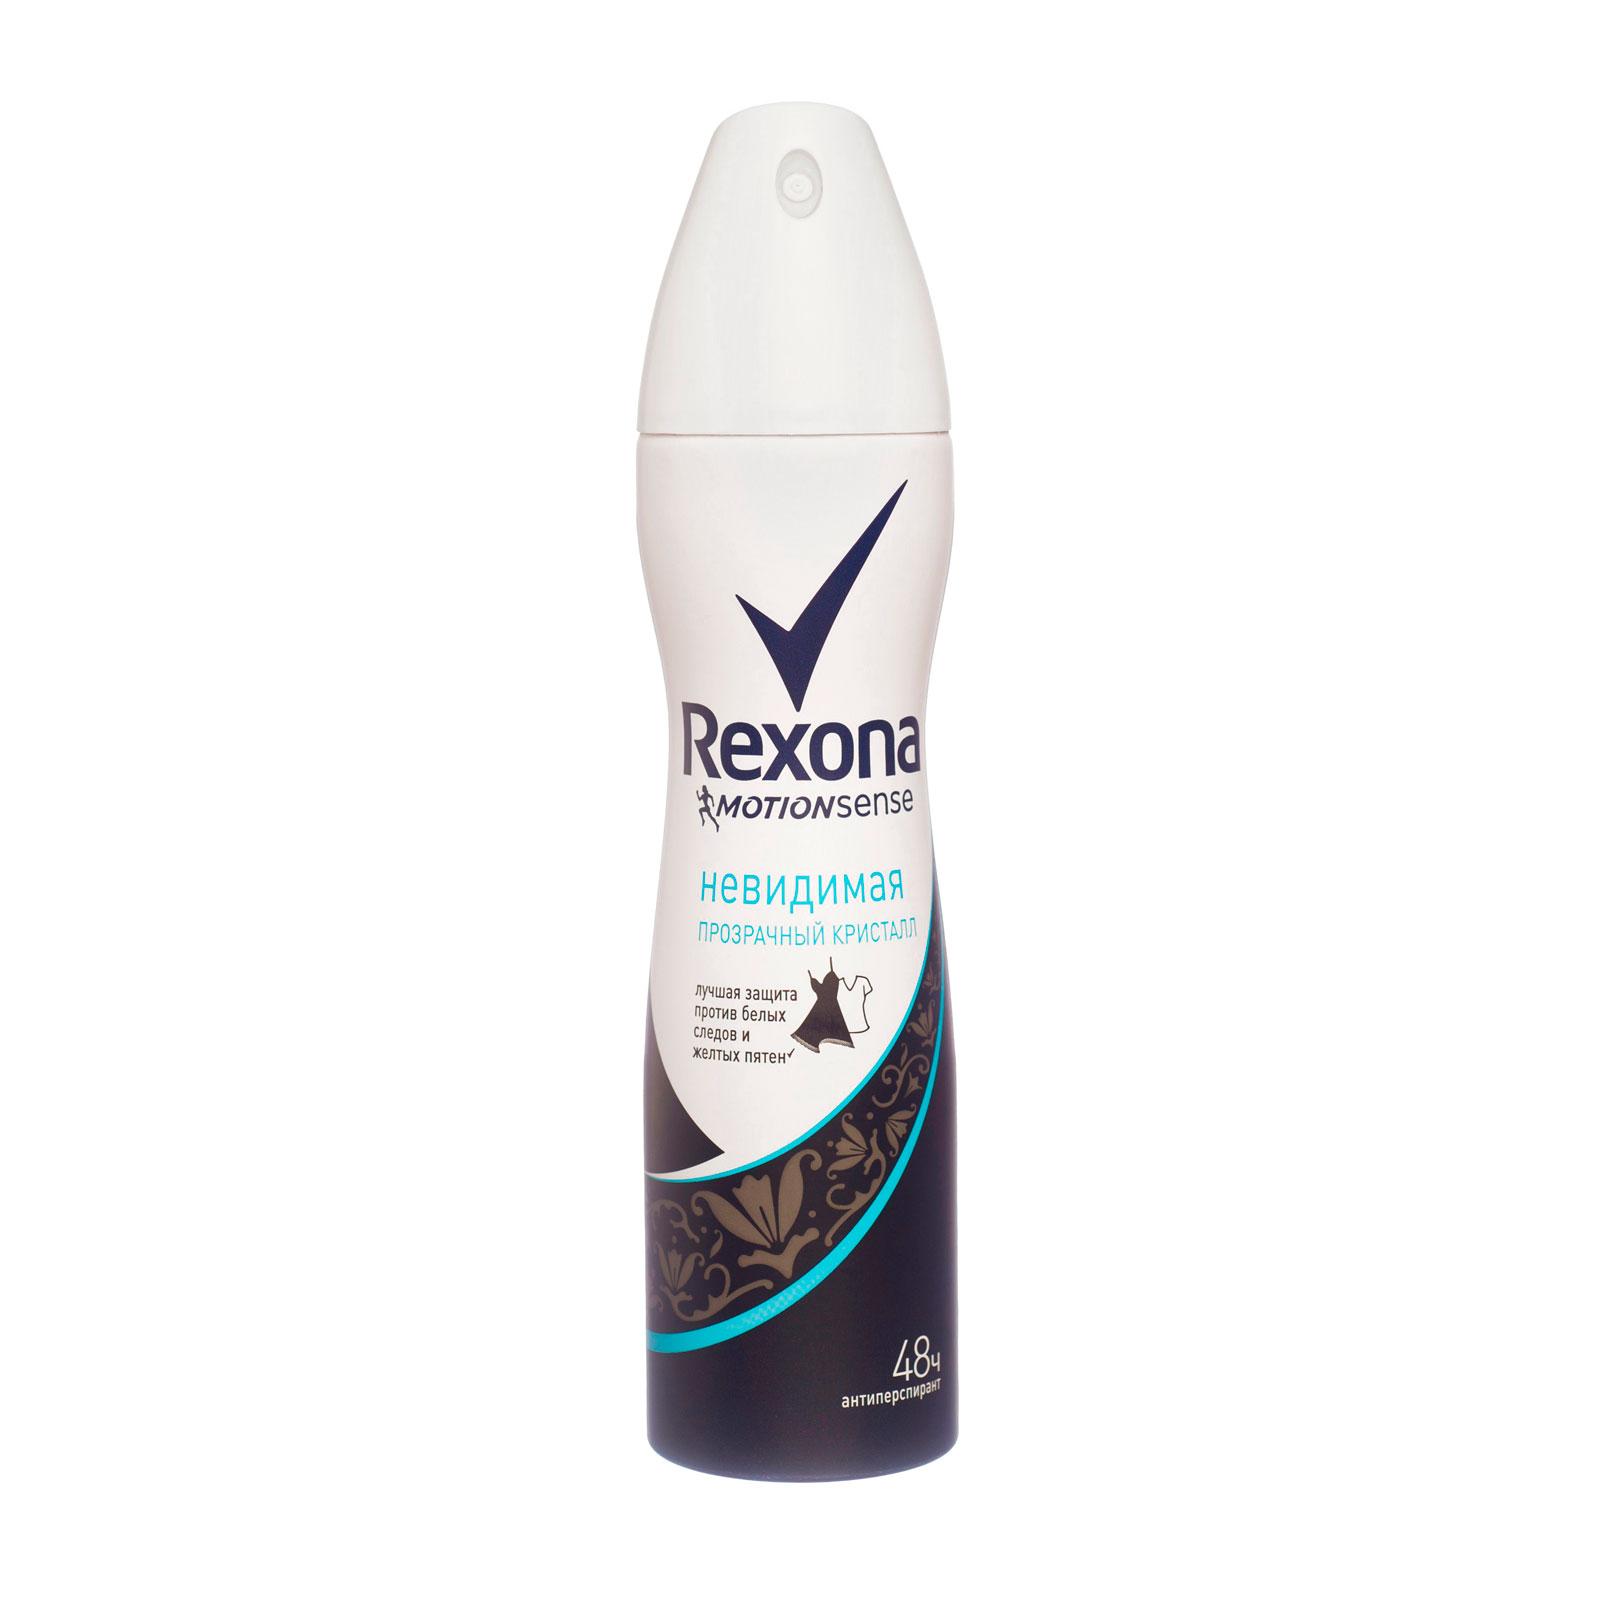 Дезодорант-аэрозоль Rexona прозрачный кристалл 150 мл<br>